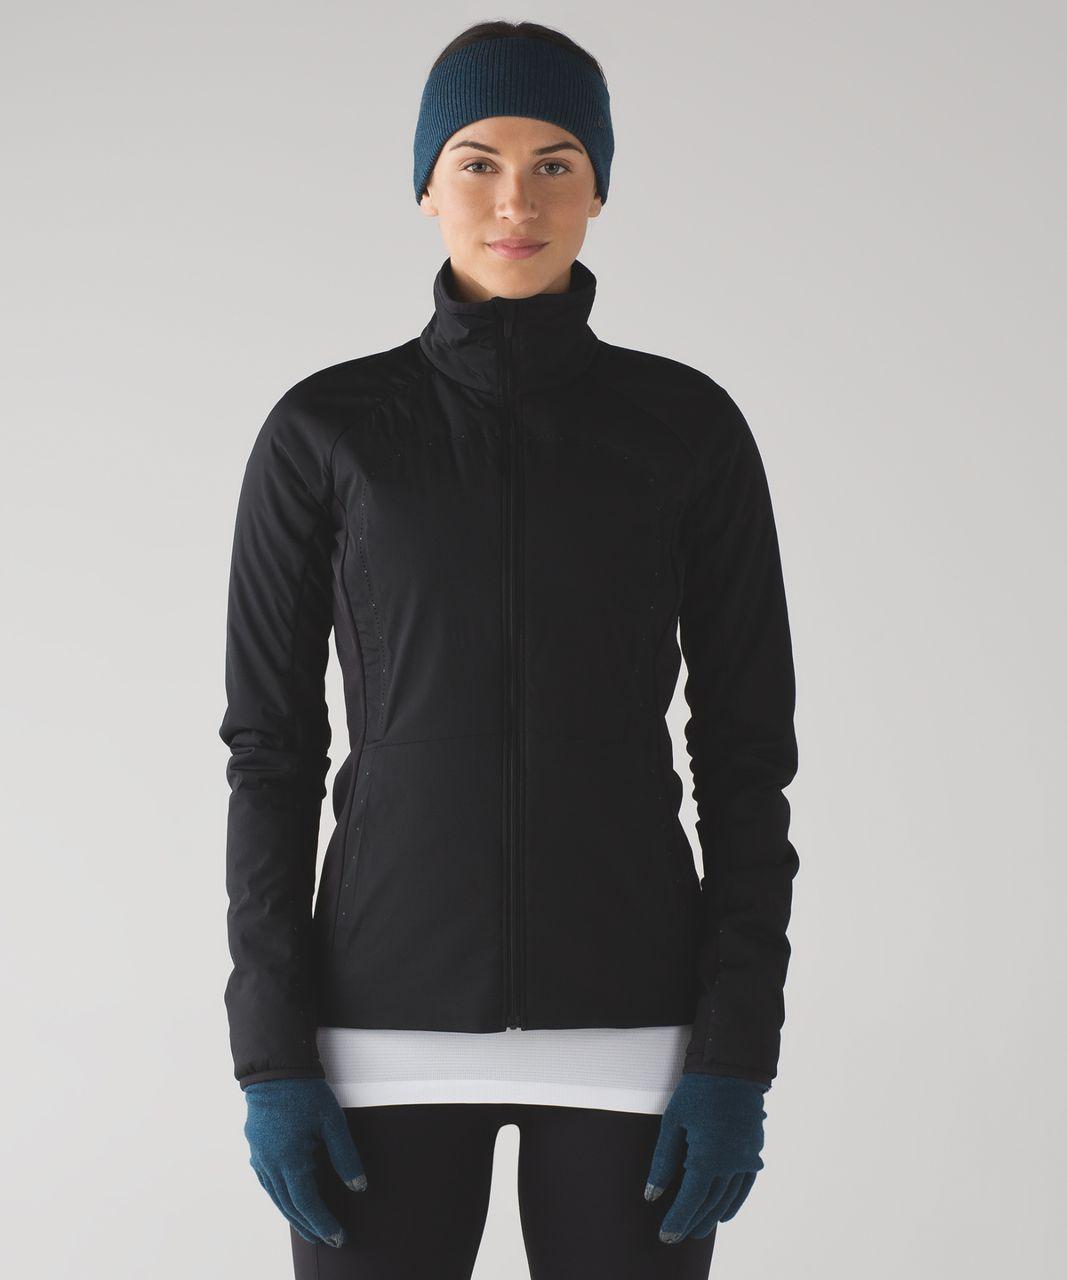 Pin On Women S Winter Running Gear [ 1280 x 1067 Pixel ]